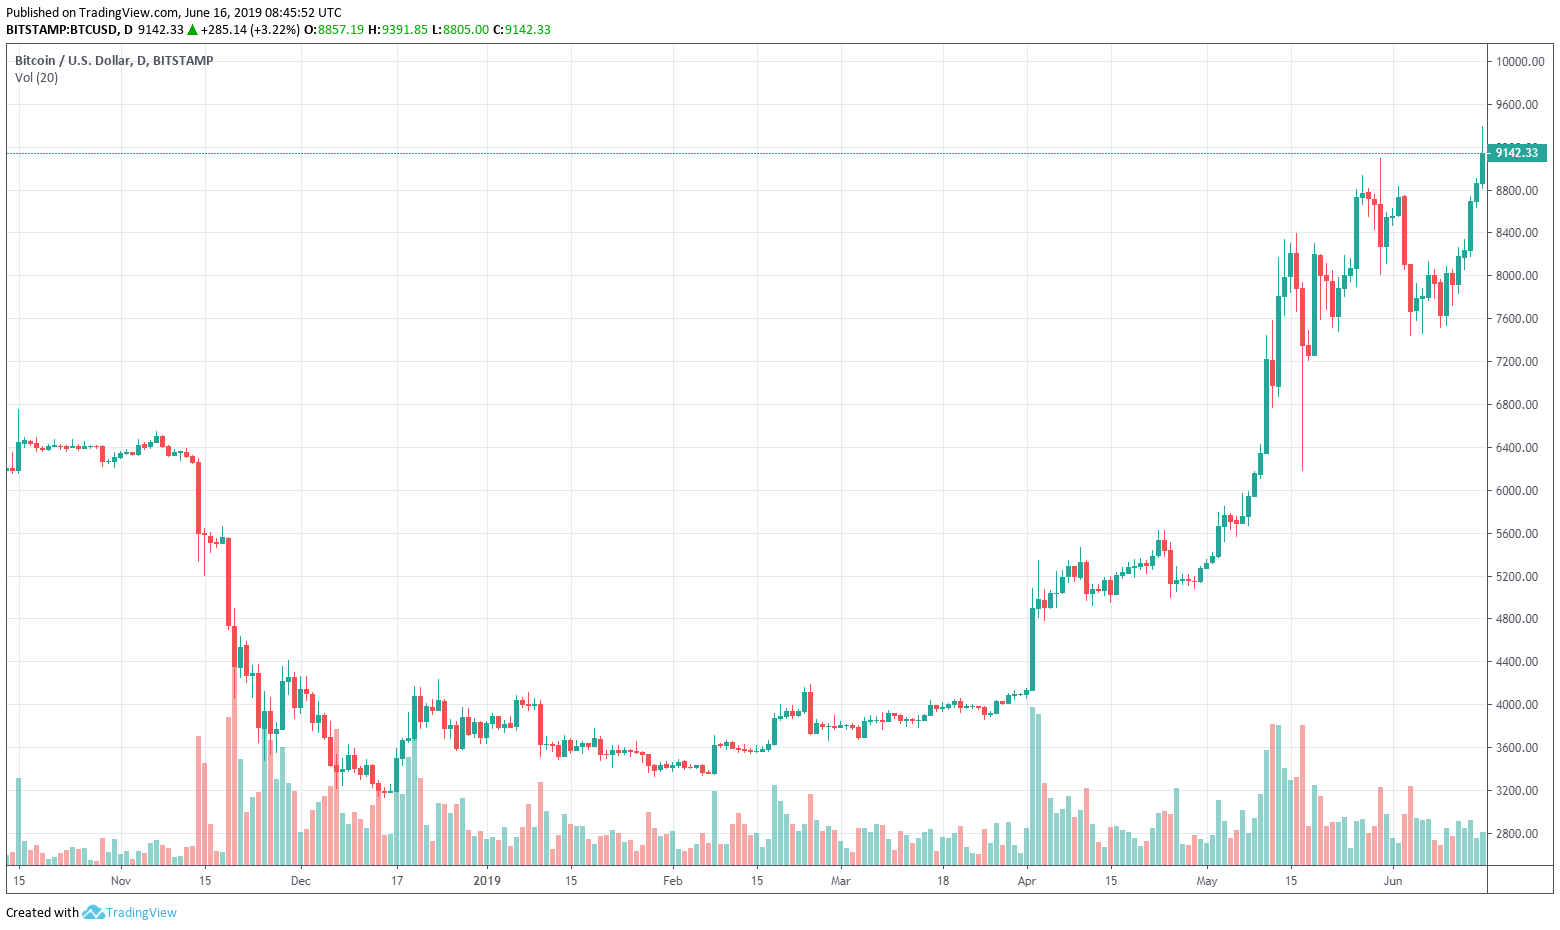 A Bitcoin növekedése ma